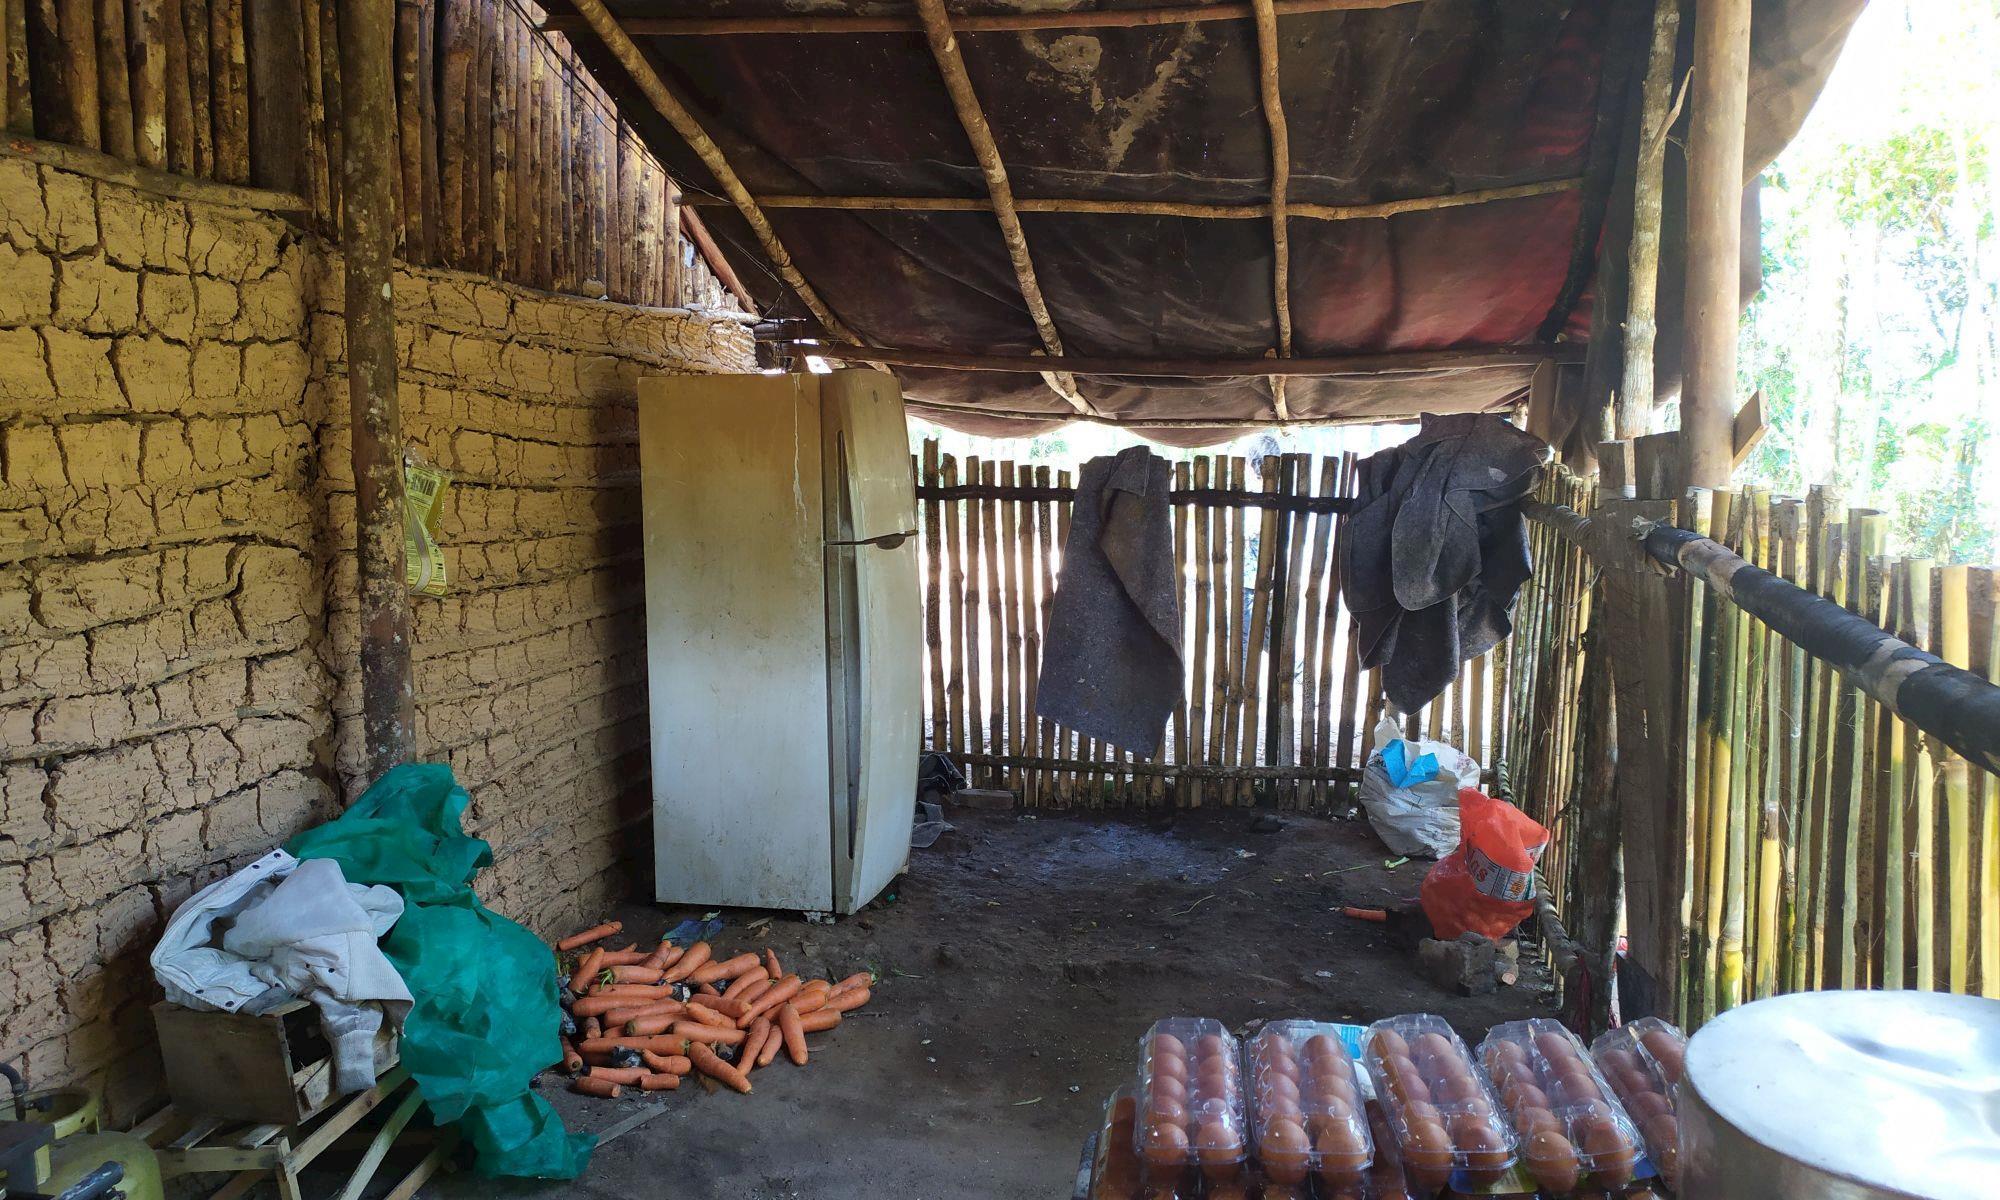 cozinha, aldeia, tapirai, guarani, BAS, Fernanda Ikedo/Imprensa SMetal